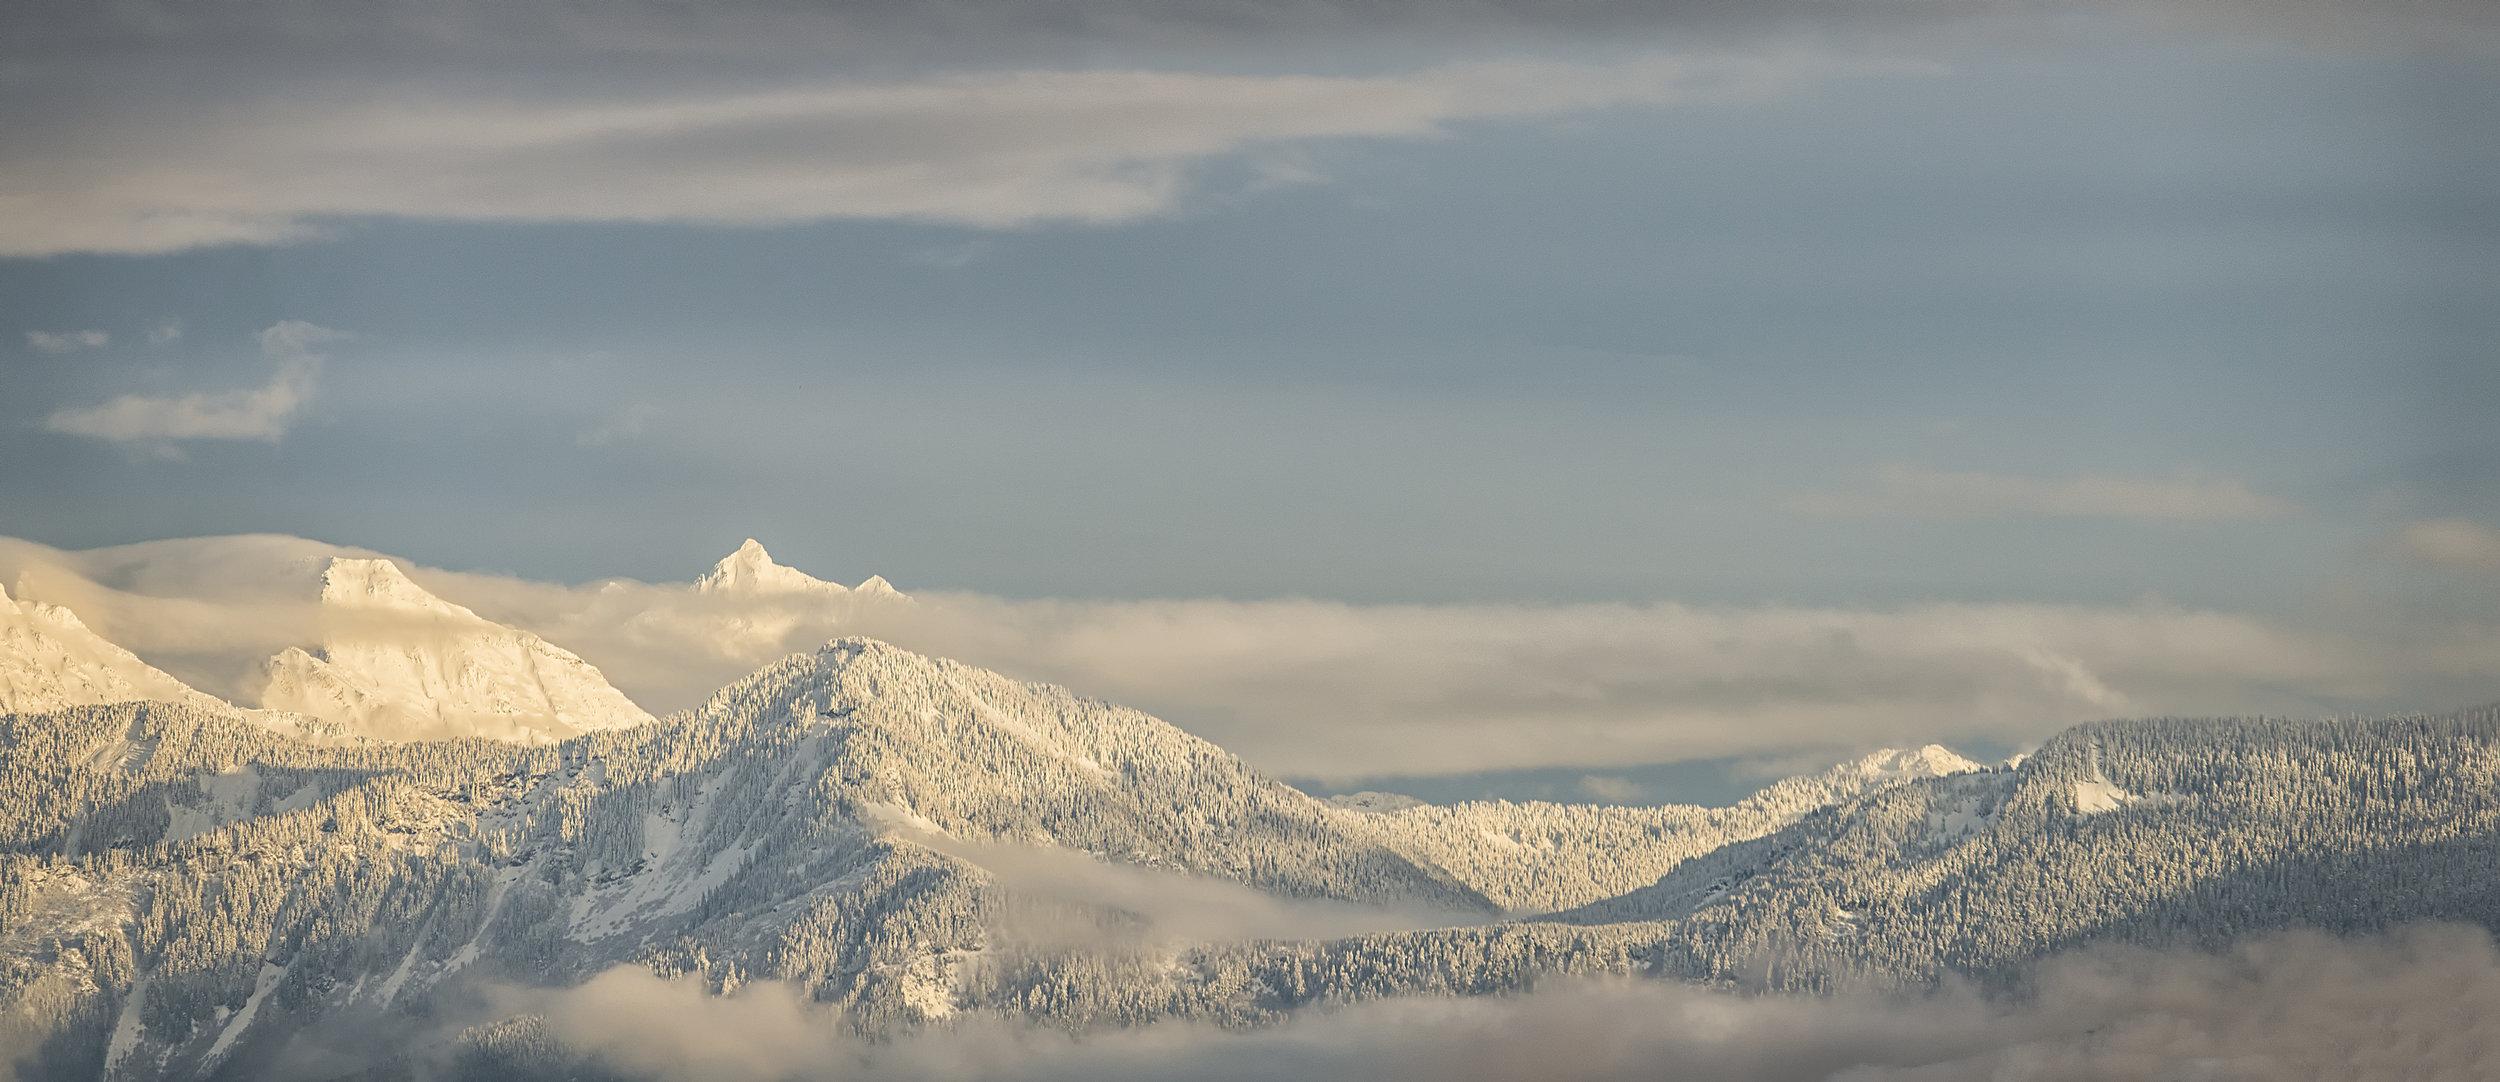 SNOW TOP MOUNTIANS .jpg